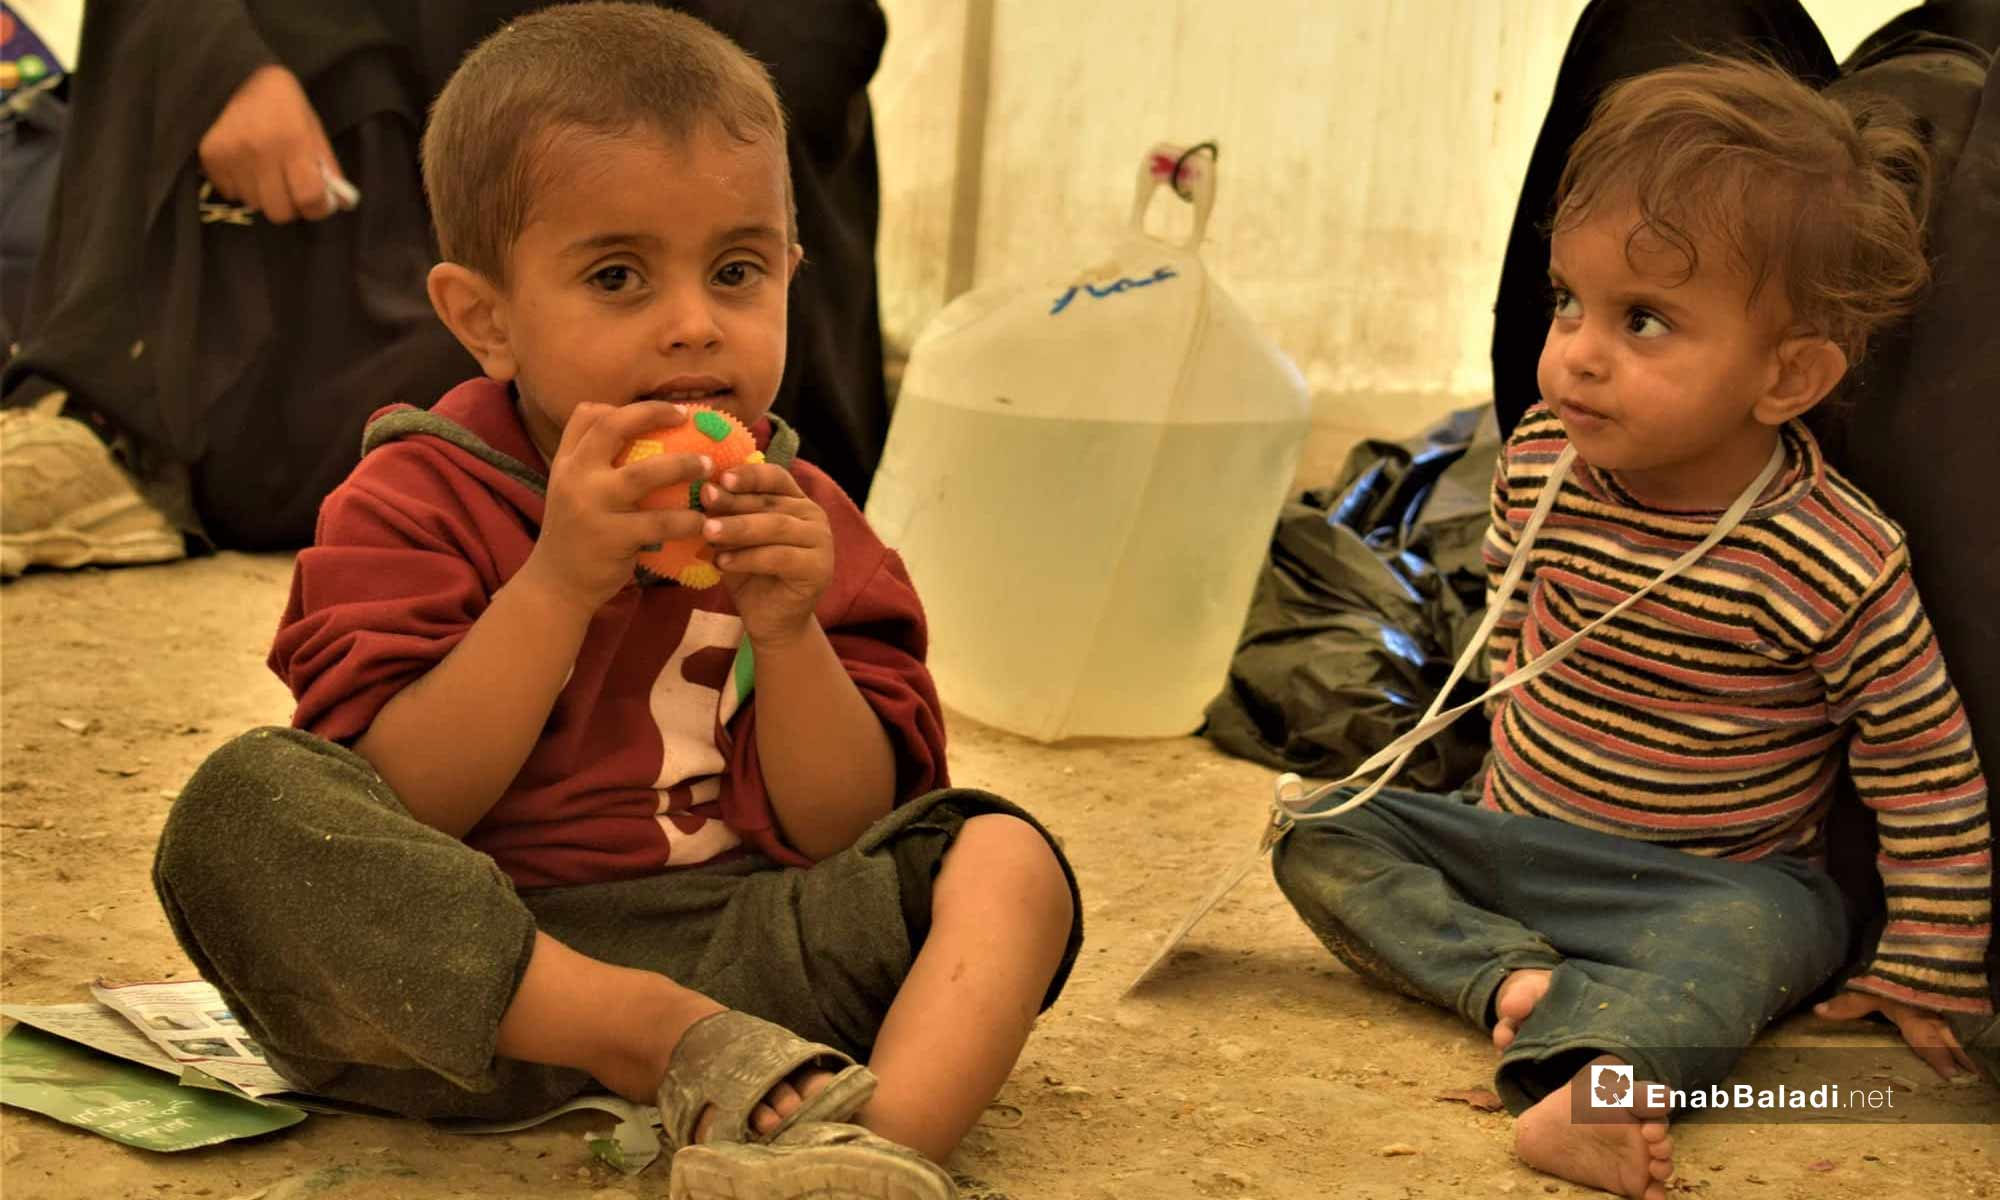 Children at the al-Hawl IDP Camp, east of the Euphrates – July 18, 2019 (Enab Baladi)